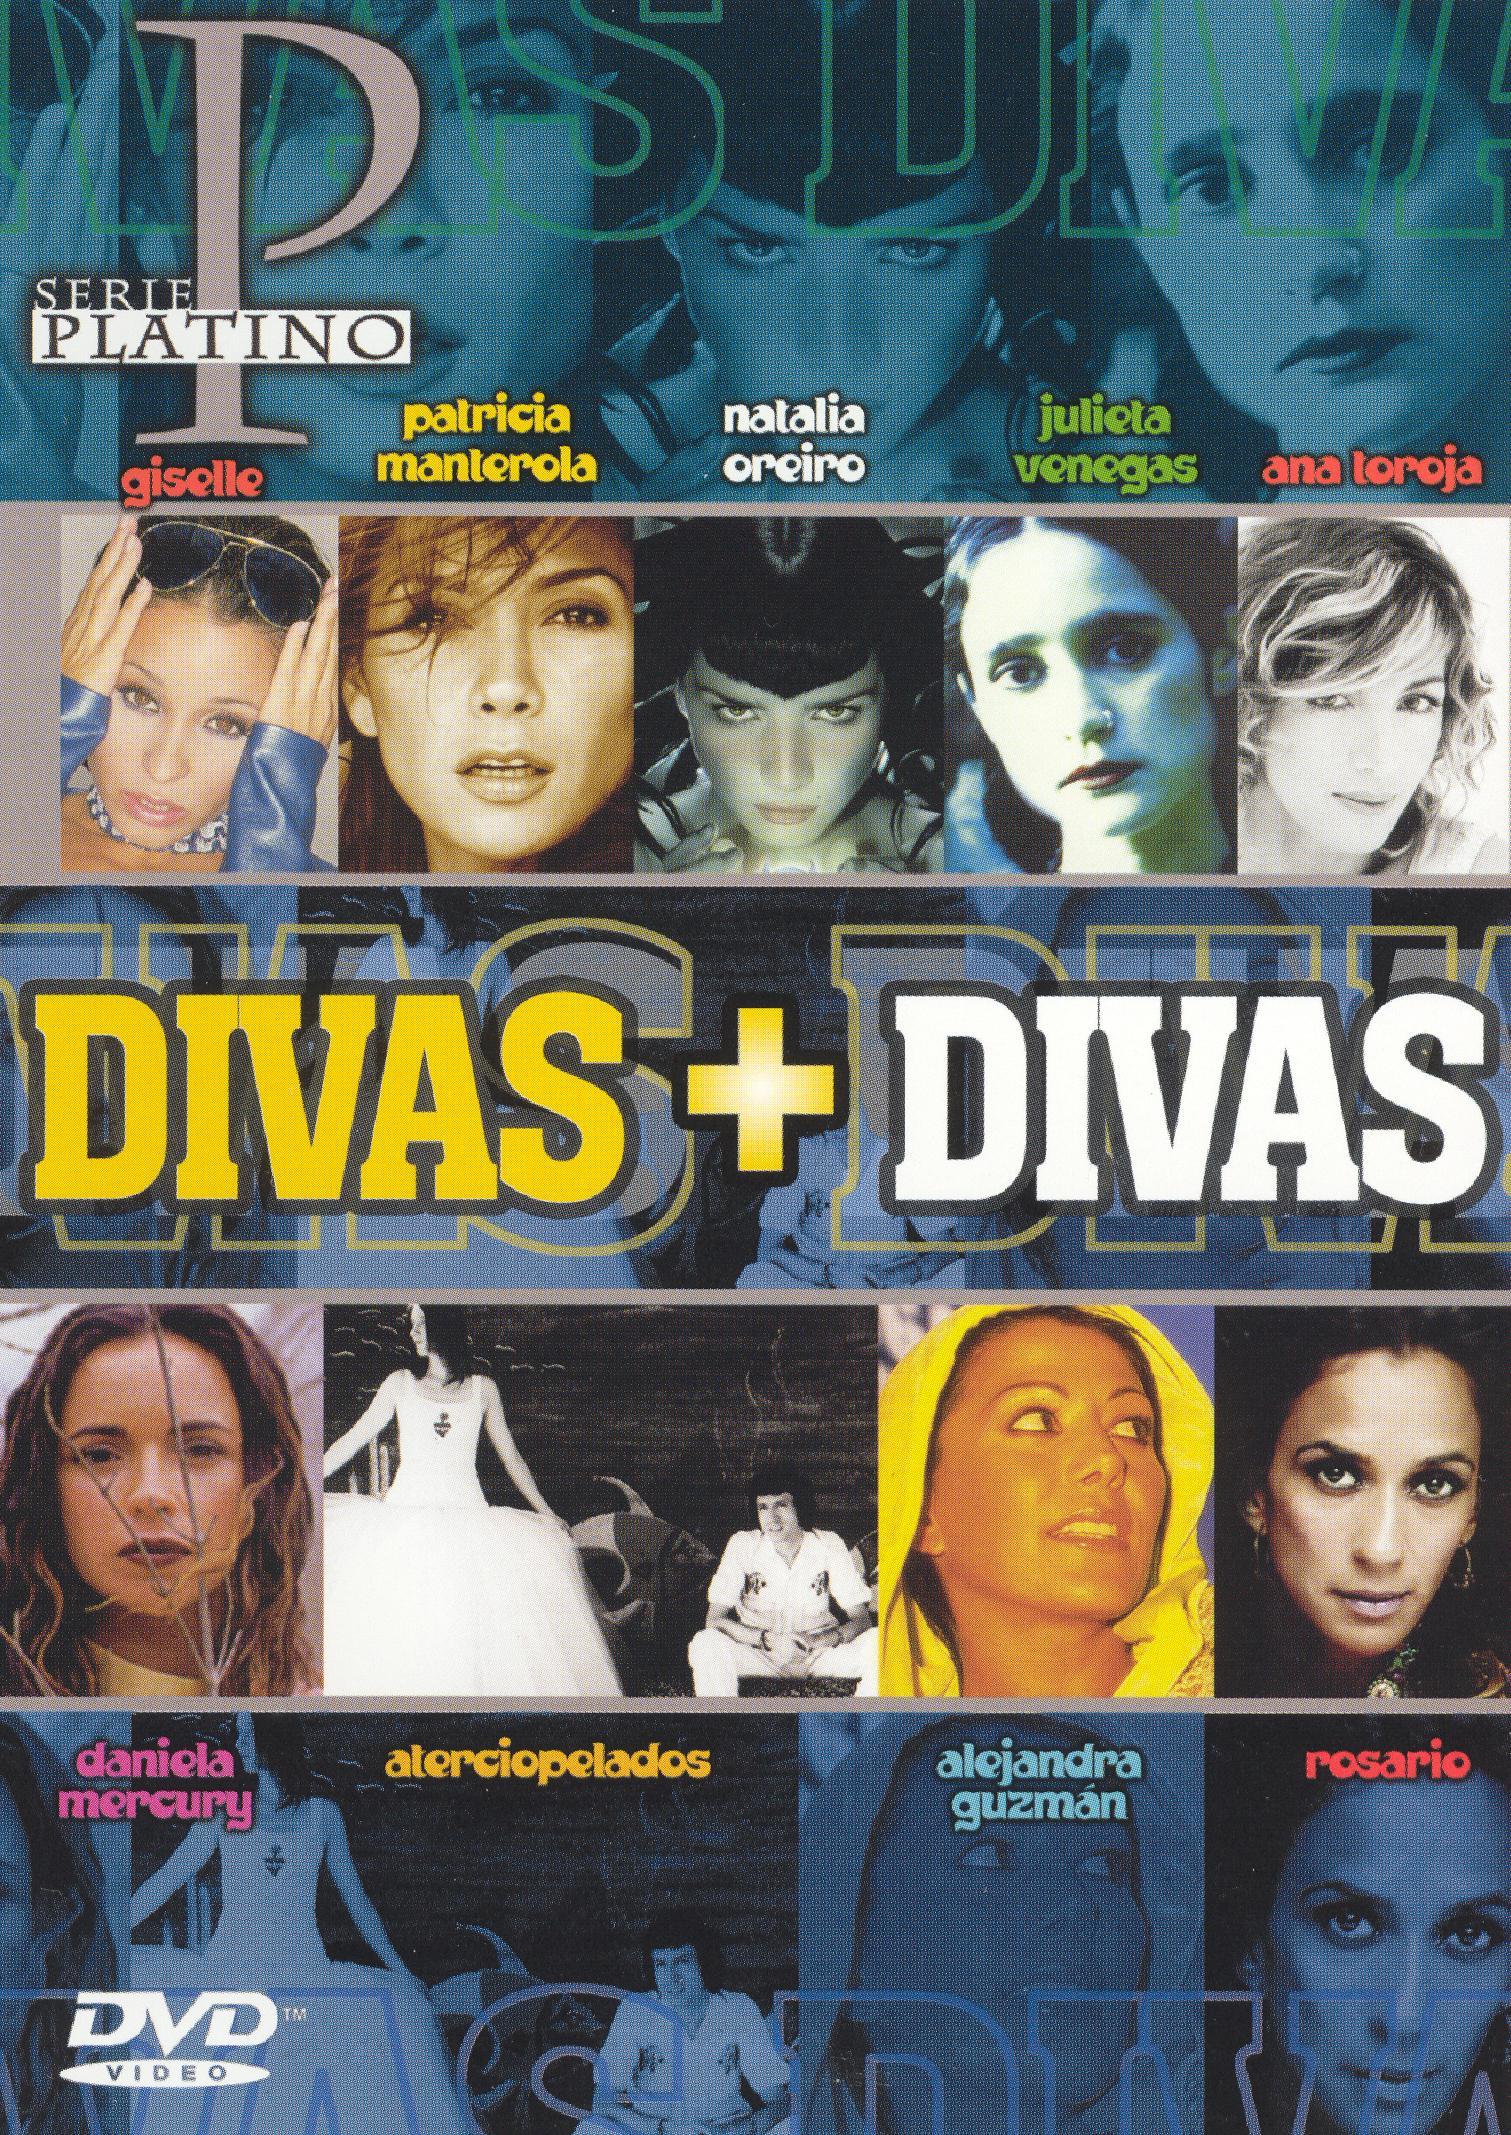 Divas + Divas: Serie Platino